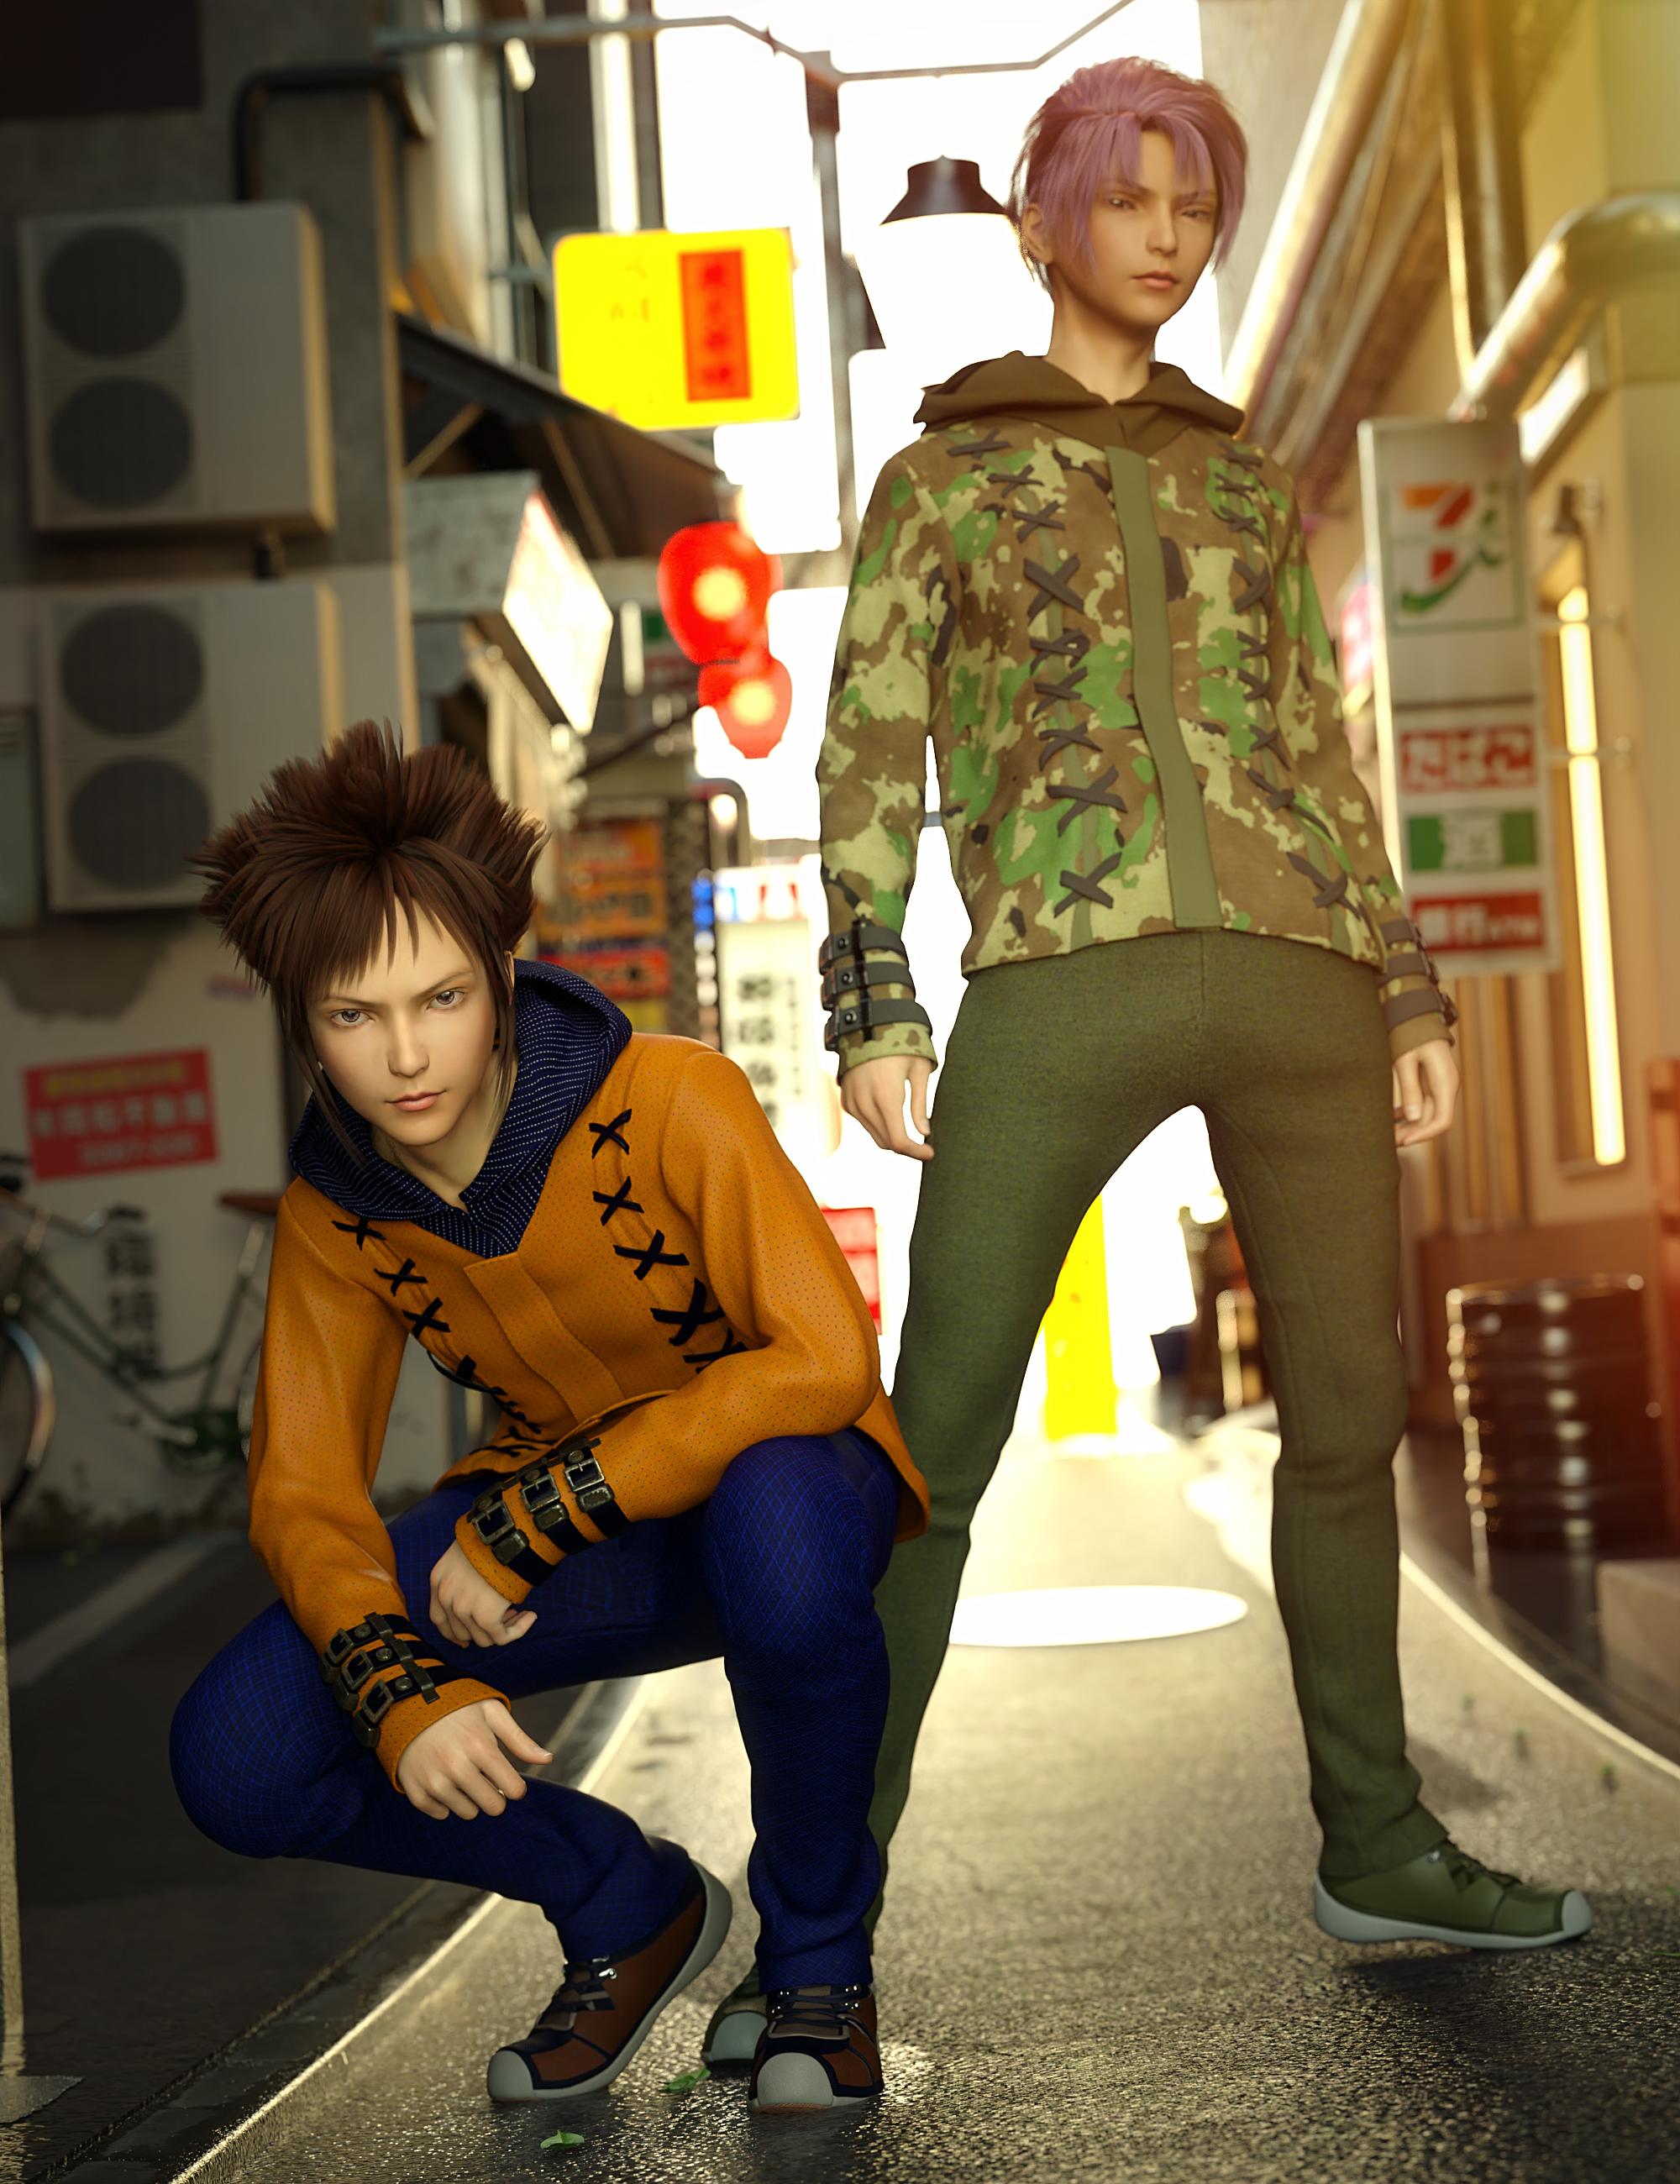 Windwalker Outfit Textures by: Anna Benjamin, 3D Models by Daz 3D